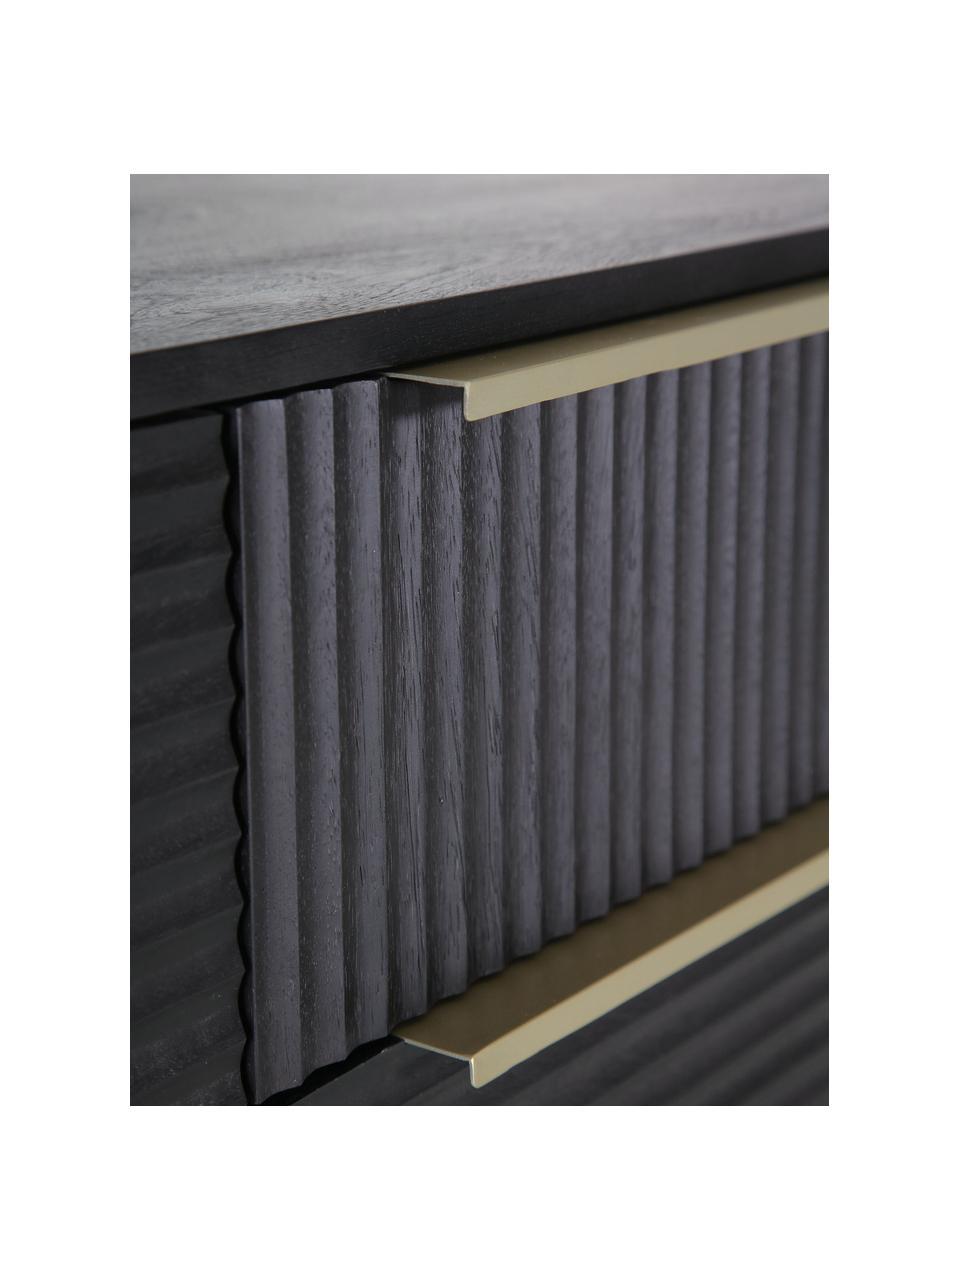 Akazienholz-Sideboard Mamba mit geriffelter Front, Korpus: Akazienholz, lackiert, Beine: Metall, lackiert, Schwarz, 175 x 77 cm